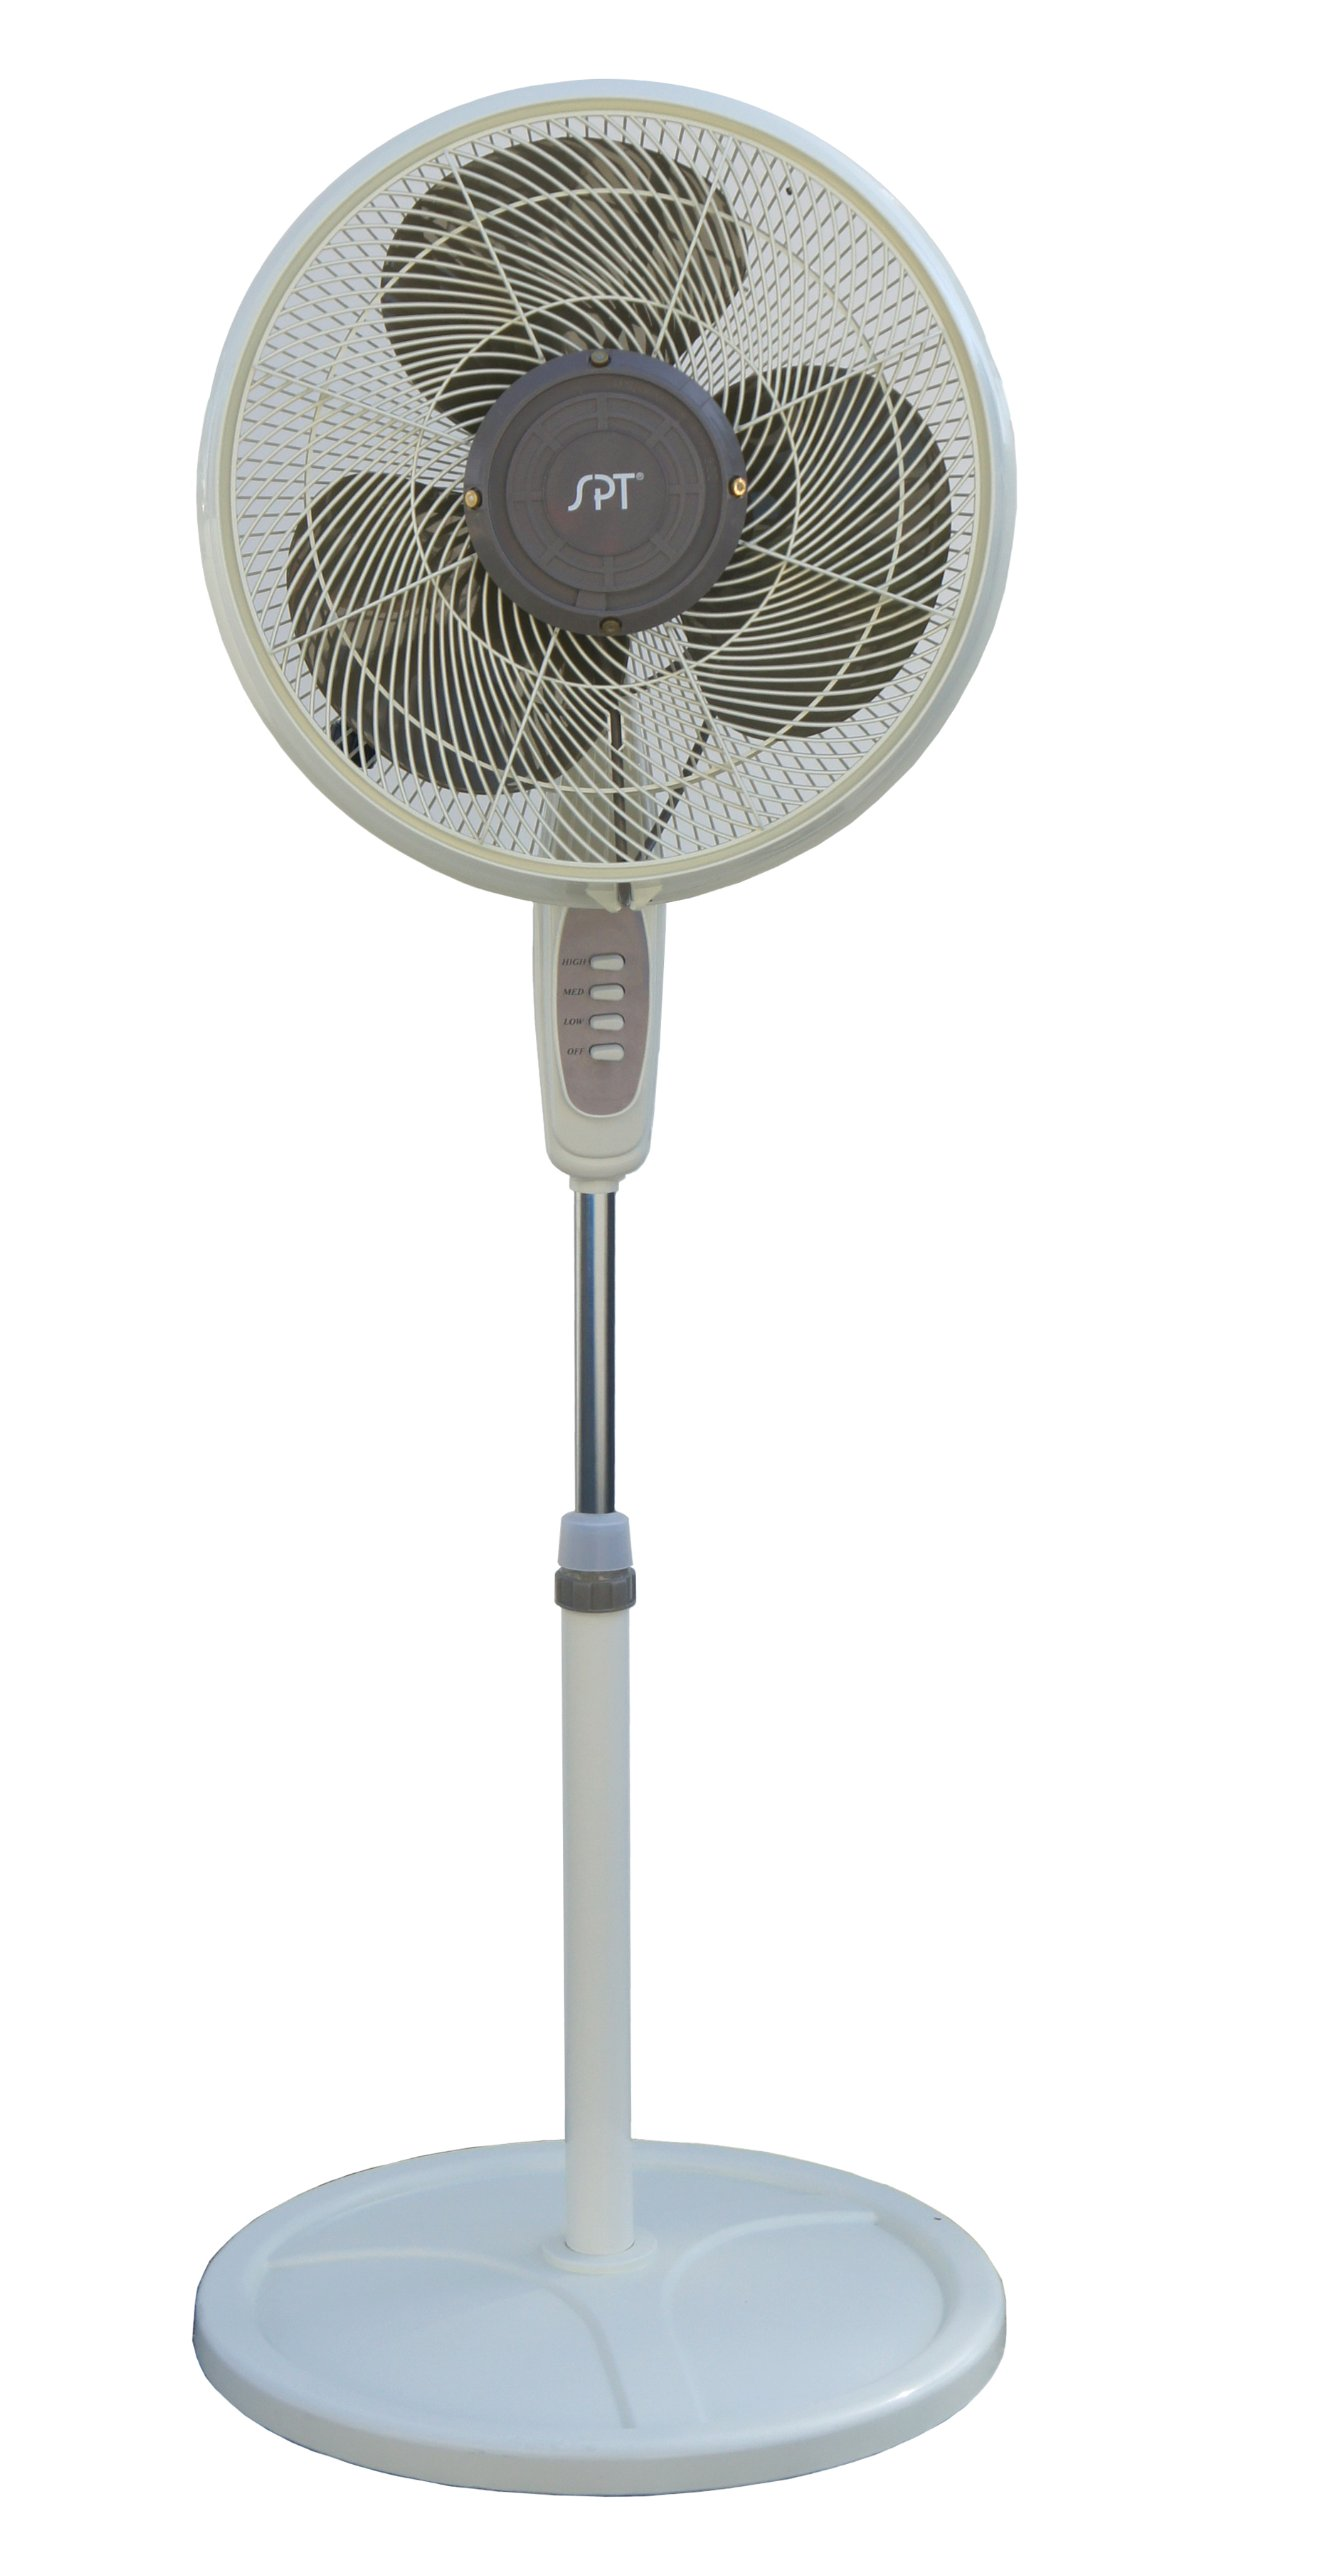 SPT SF-1666M Oscillating Misting Fan, 16-Inch